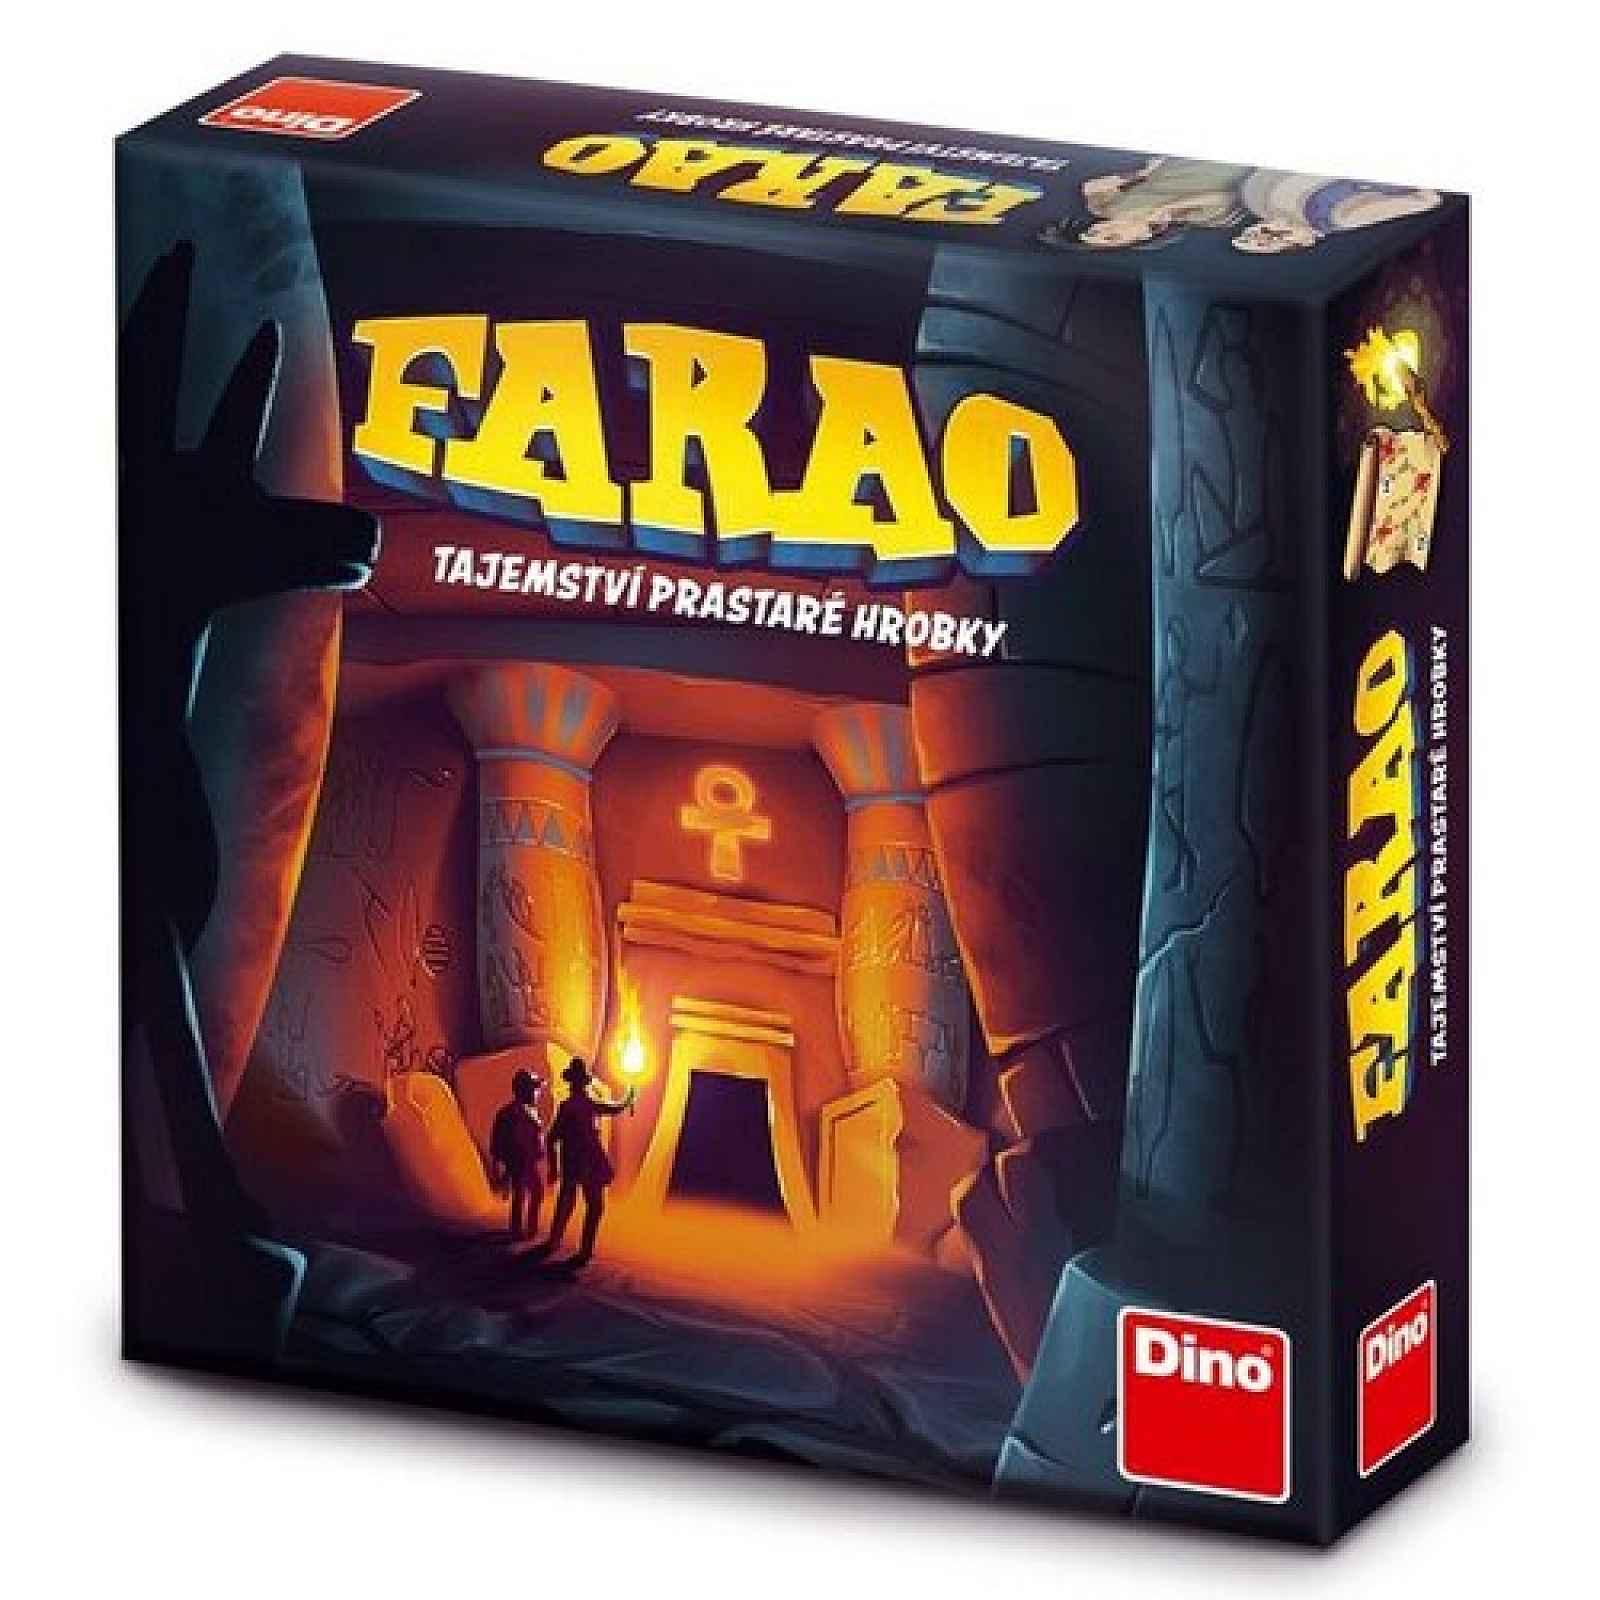 Dino Společenská hra Farao Tajemství prastaré hrobky